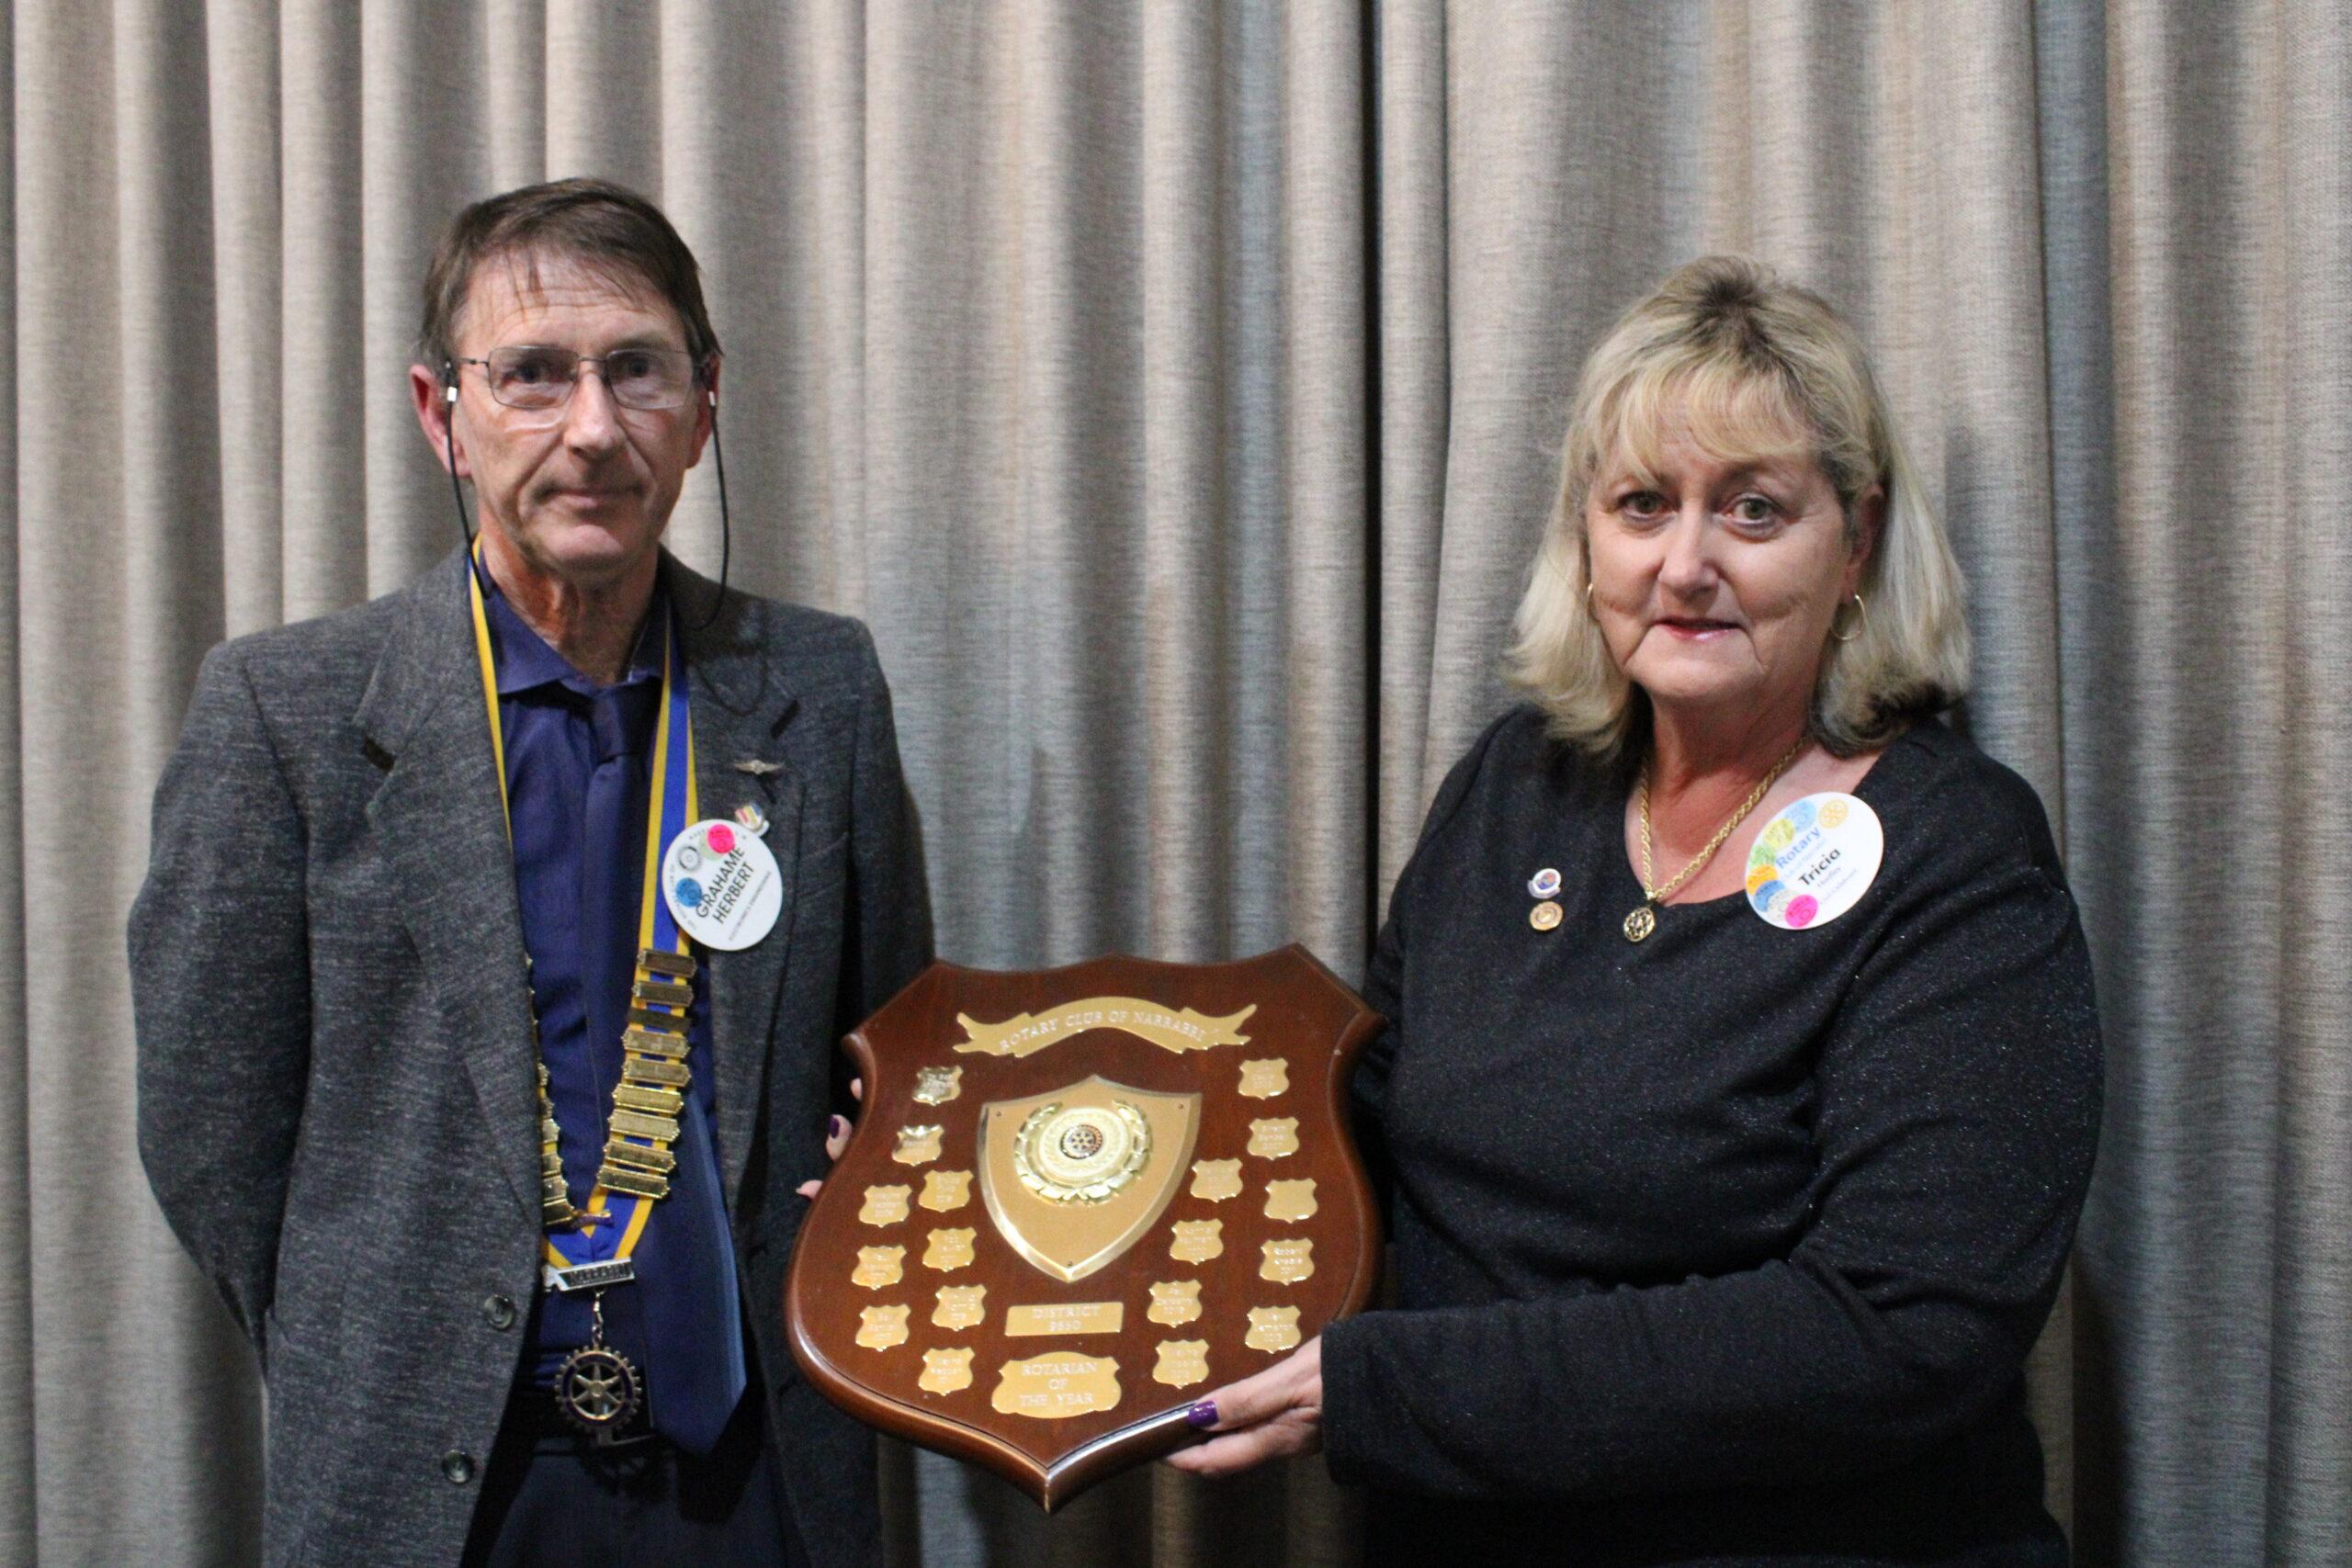 ROTARIAN OF THE YEAR: Grahame Herbert named Tricia Hadley as the Rotarian of the Year.